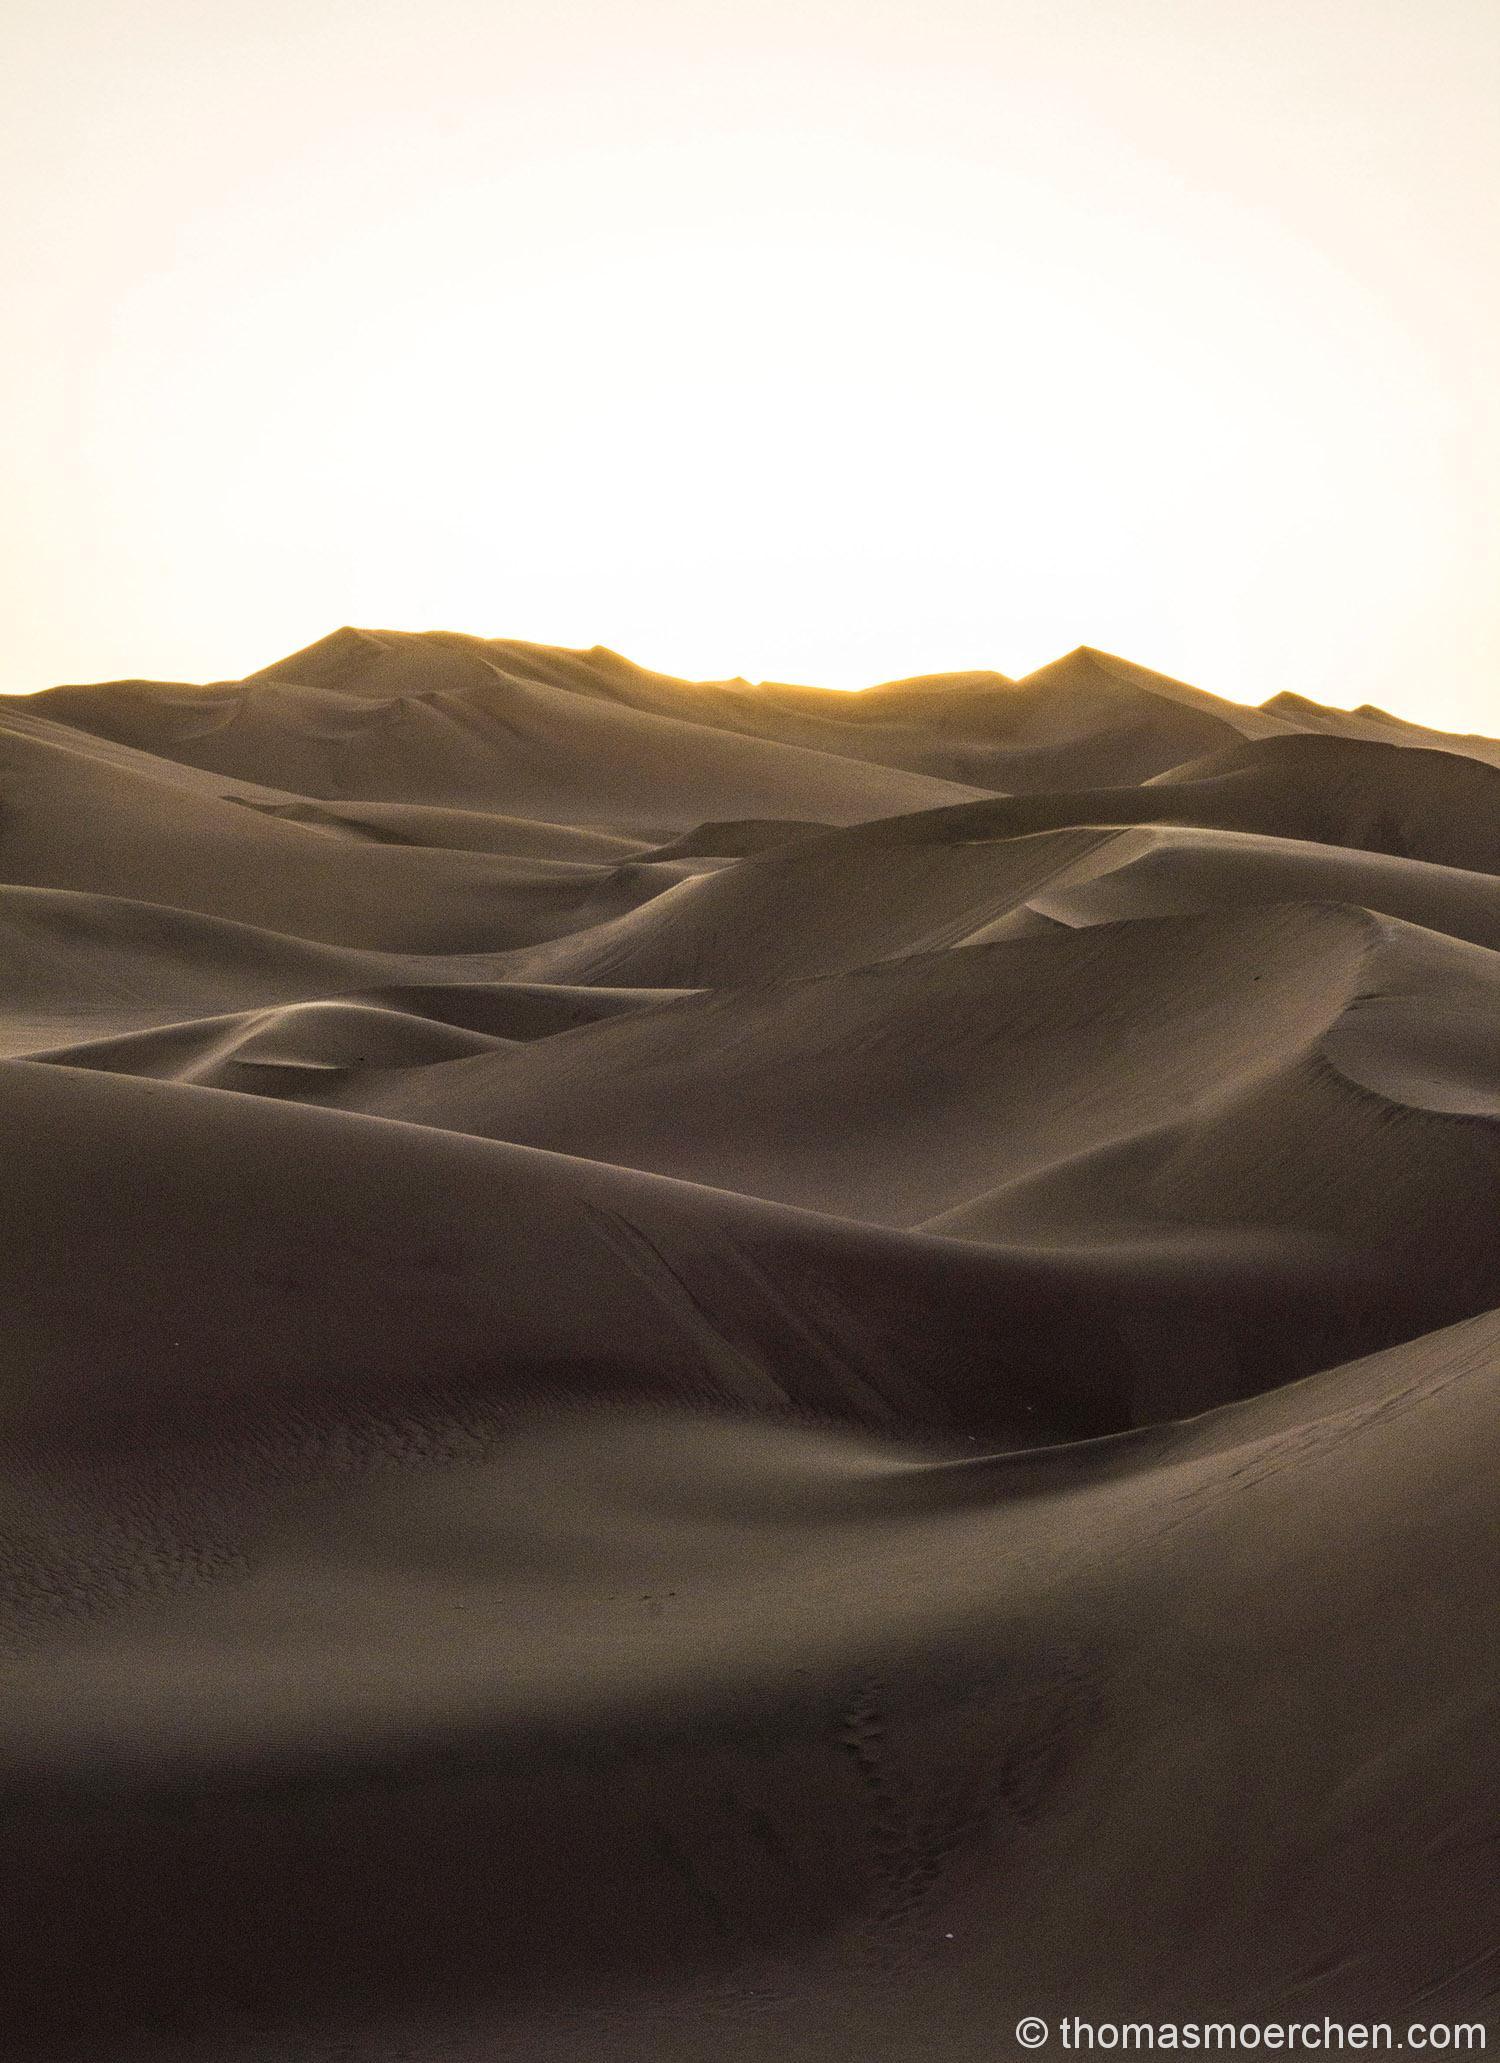 Wüste im Sonnenuntergang ...kann man anbieten